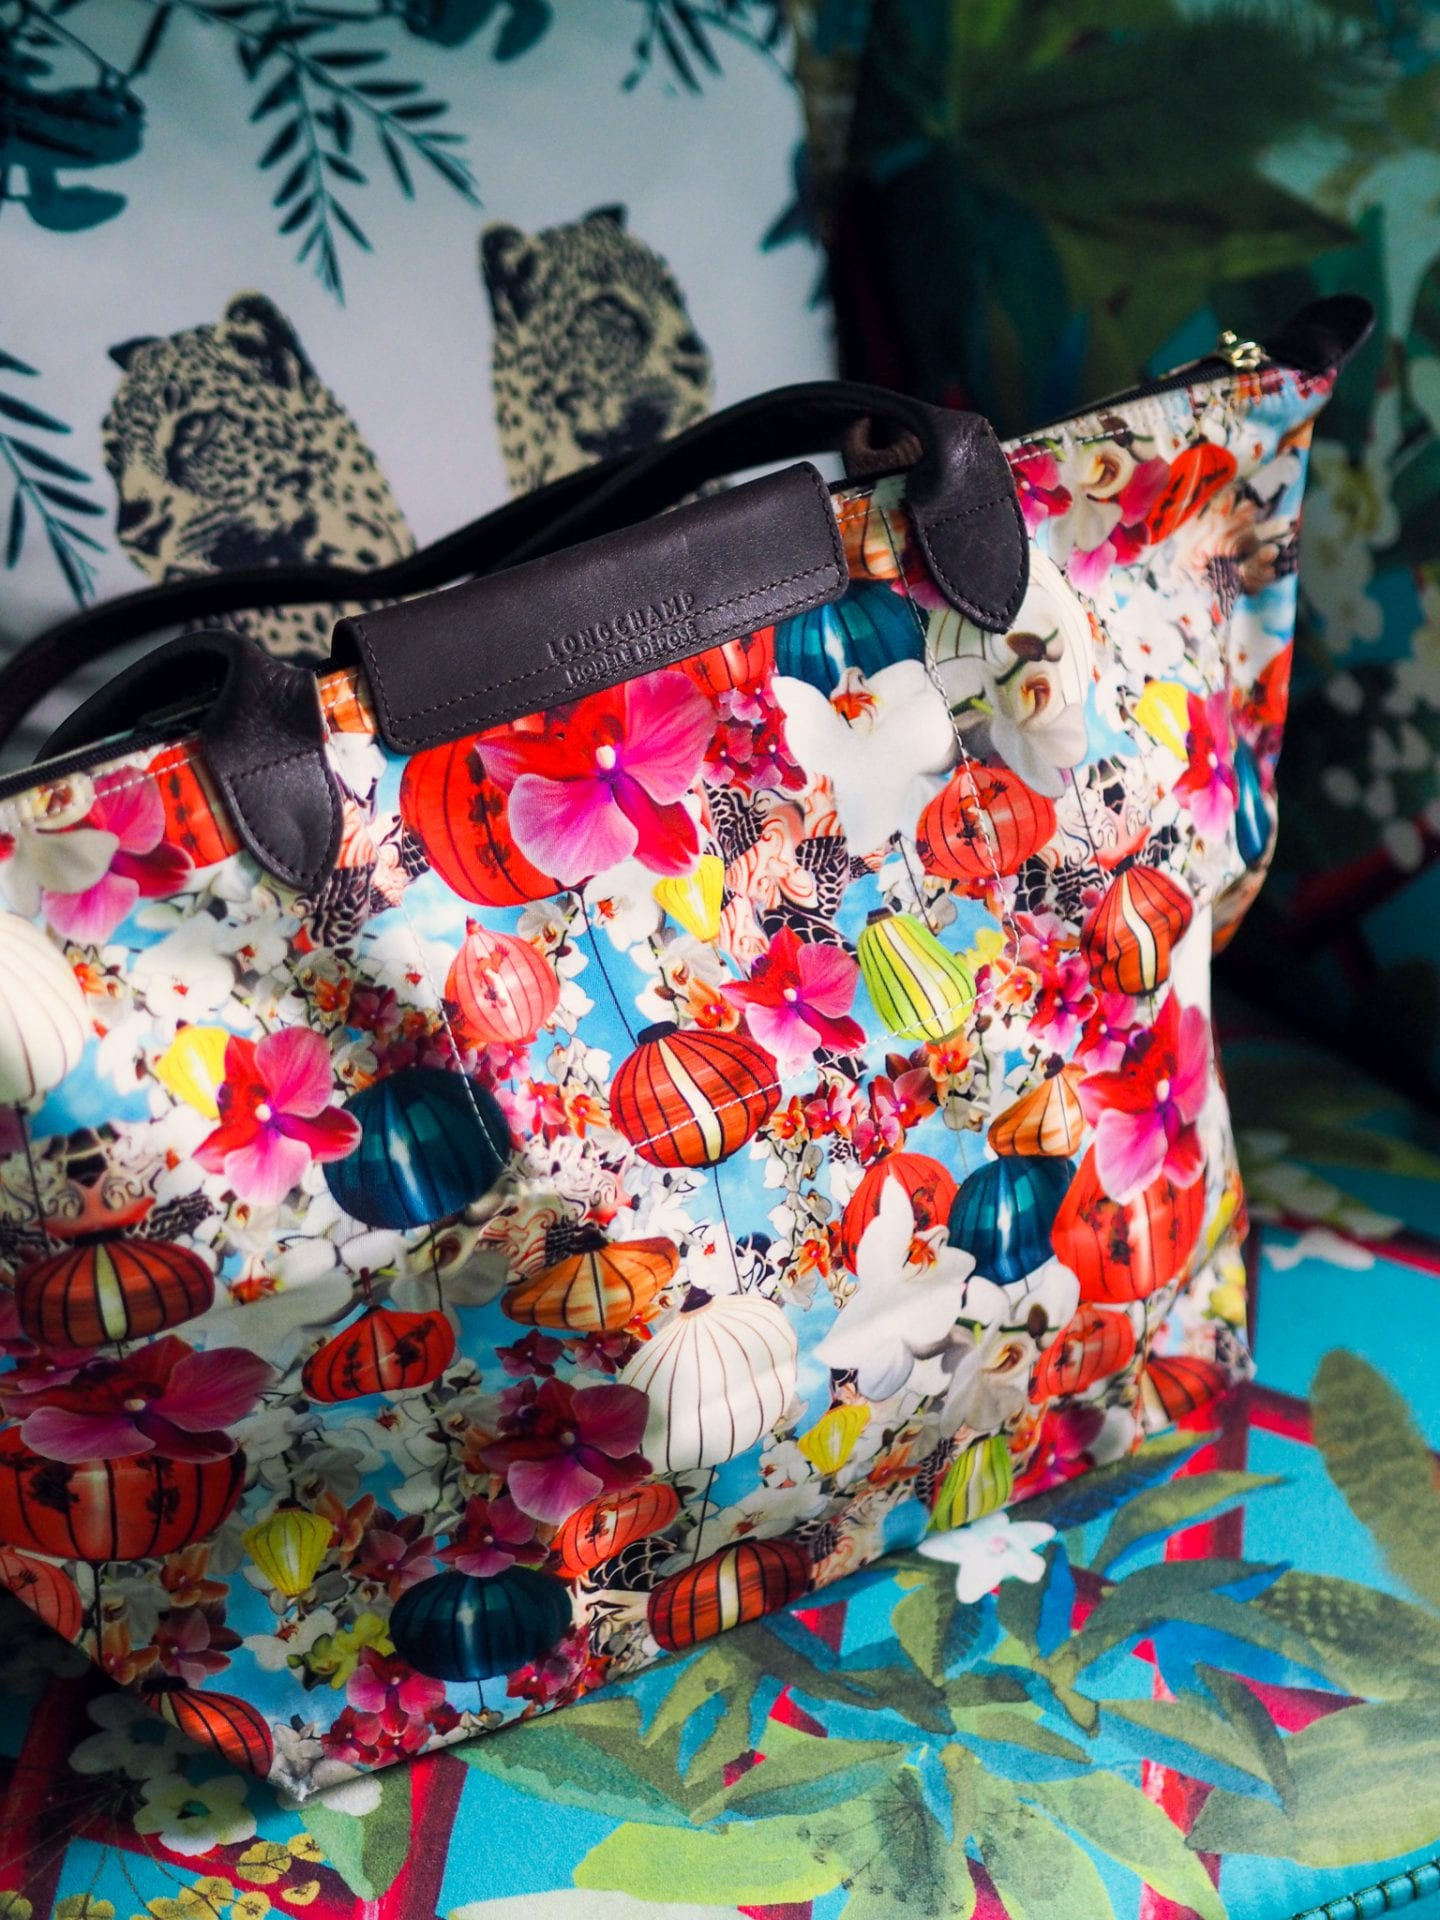 Longchamp-Bag-Review-The-Iconic-Le-Pliage-Neo-back-bag-handbag